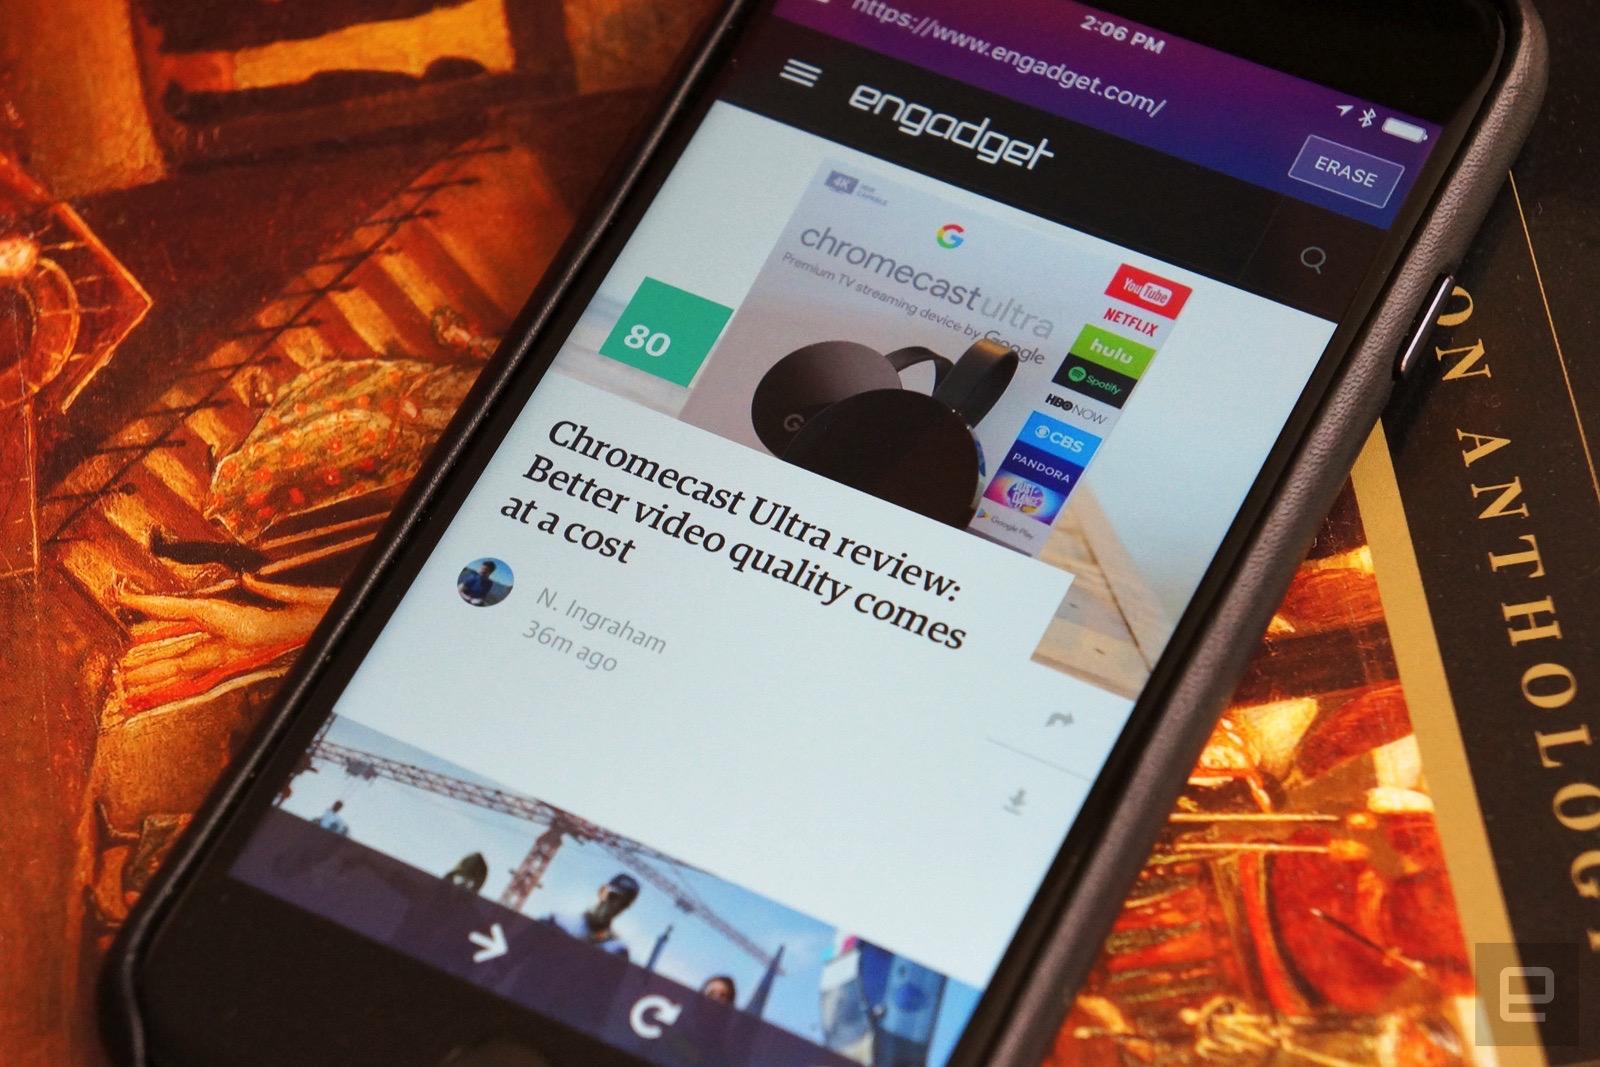 Mozilla 為行動版 Firefox 帶來幾項實用新功能